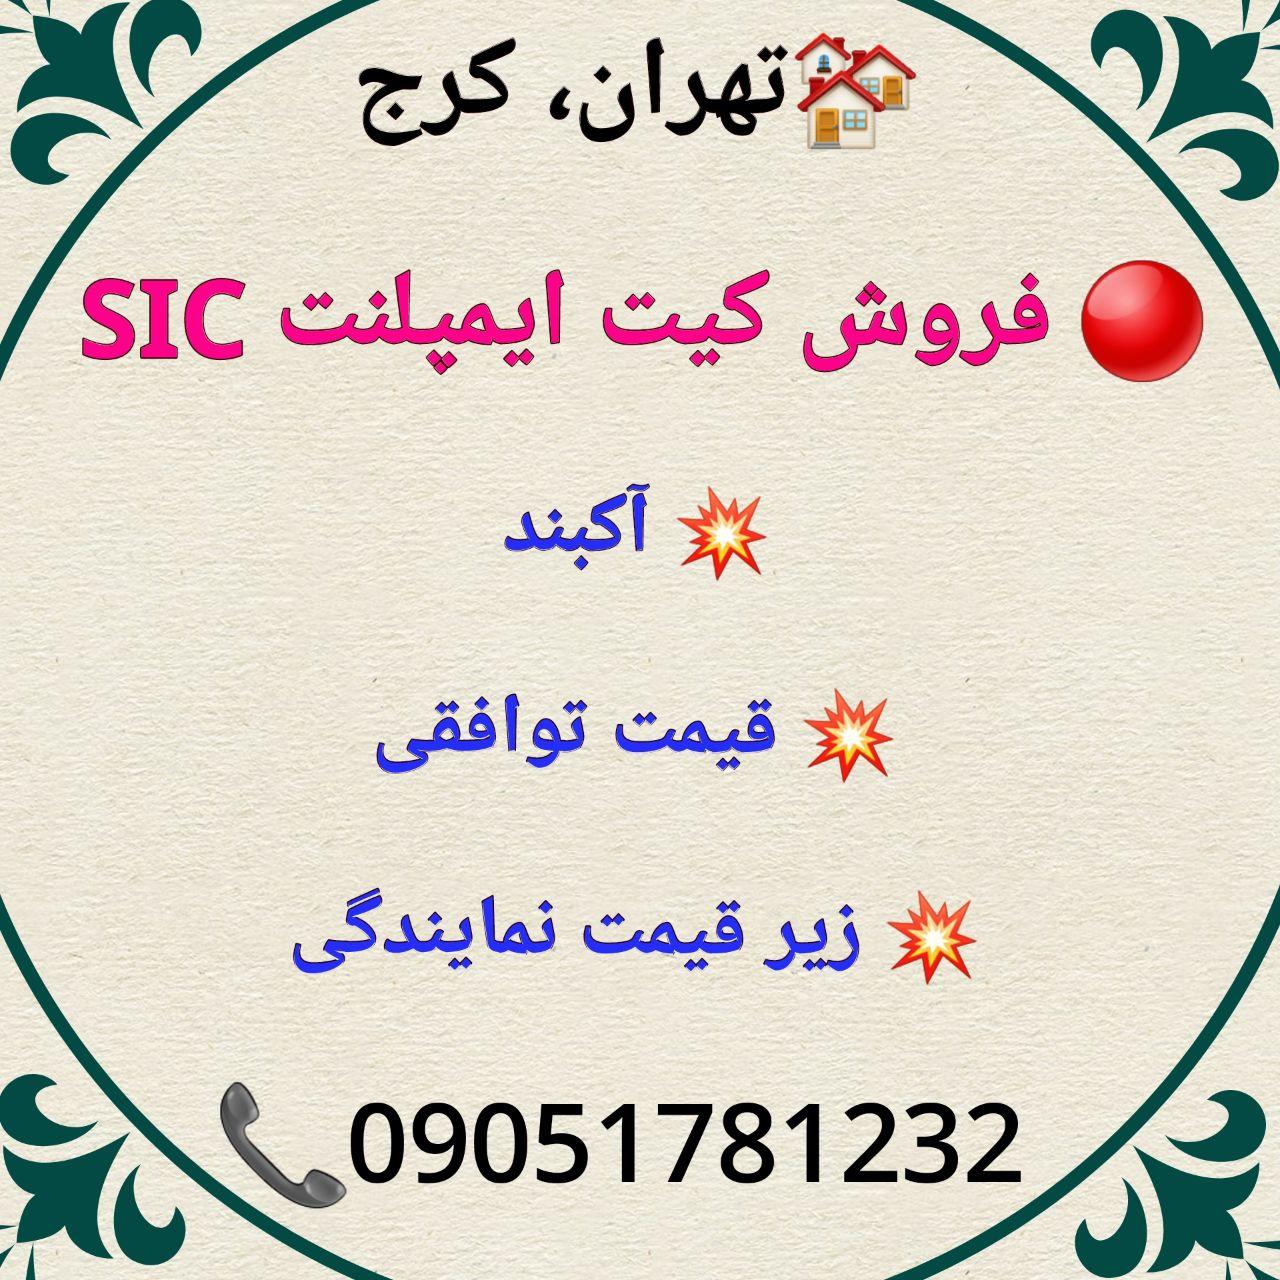 تهران: کرج، فروش کیت ایمپلنت SIC